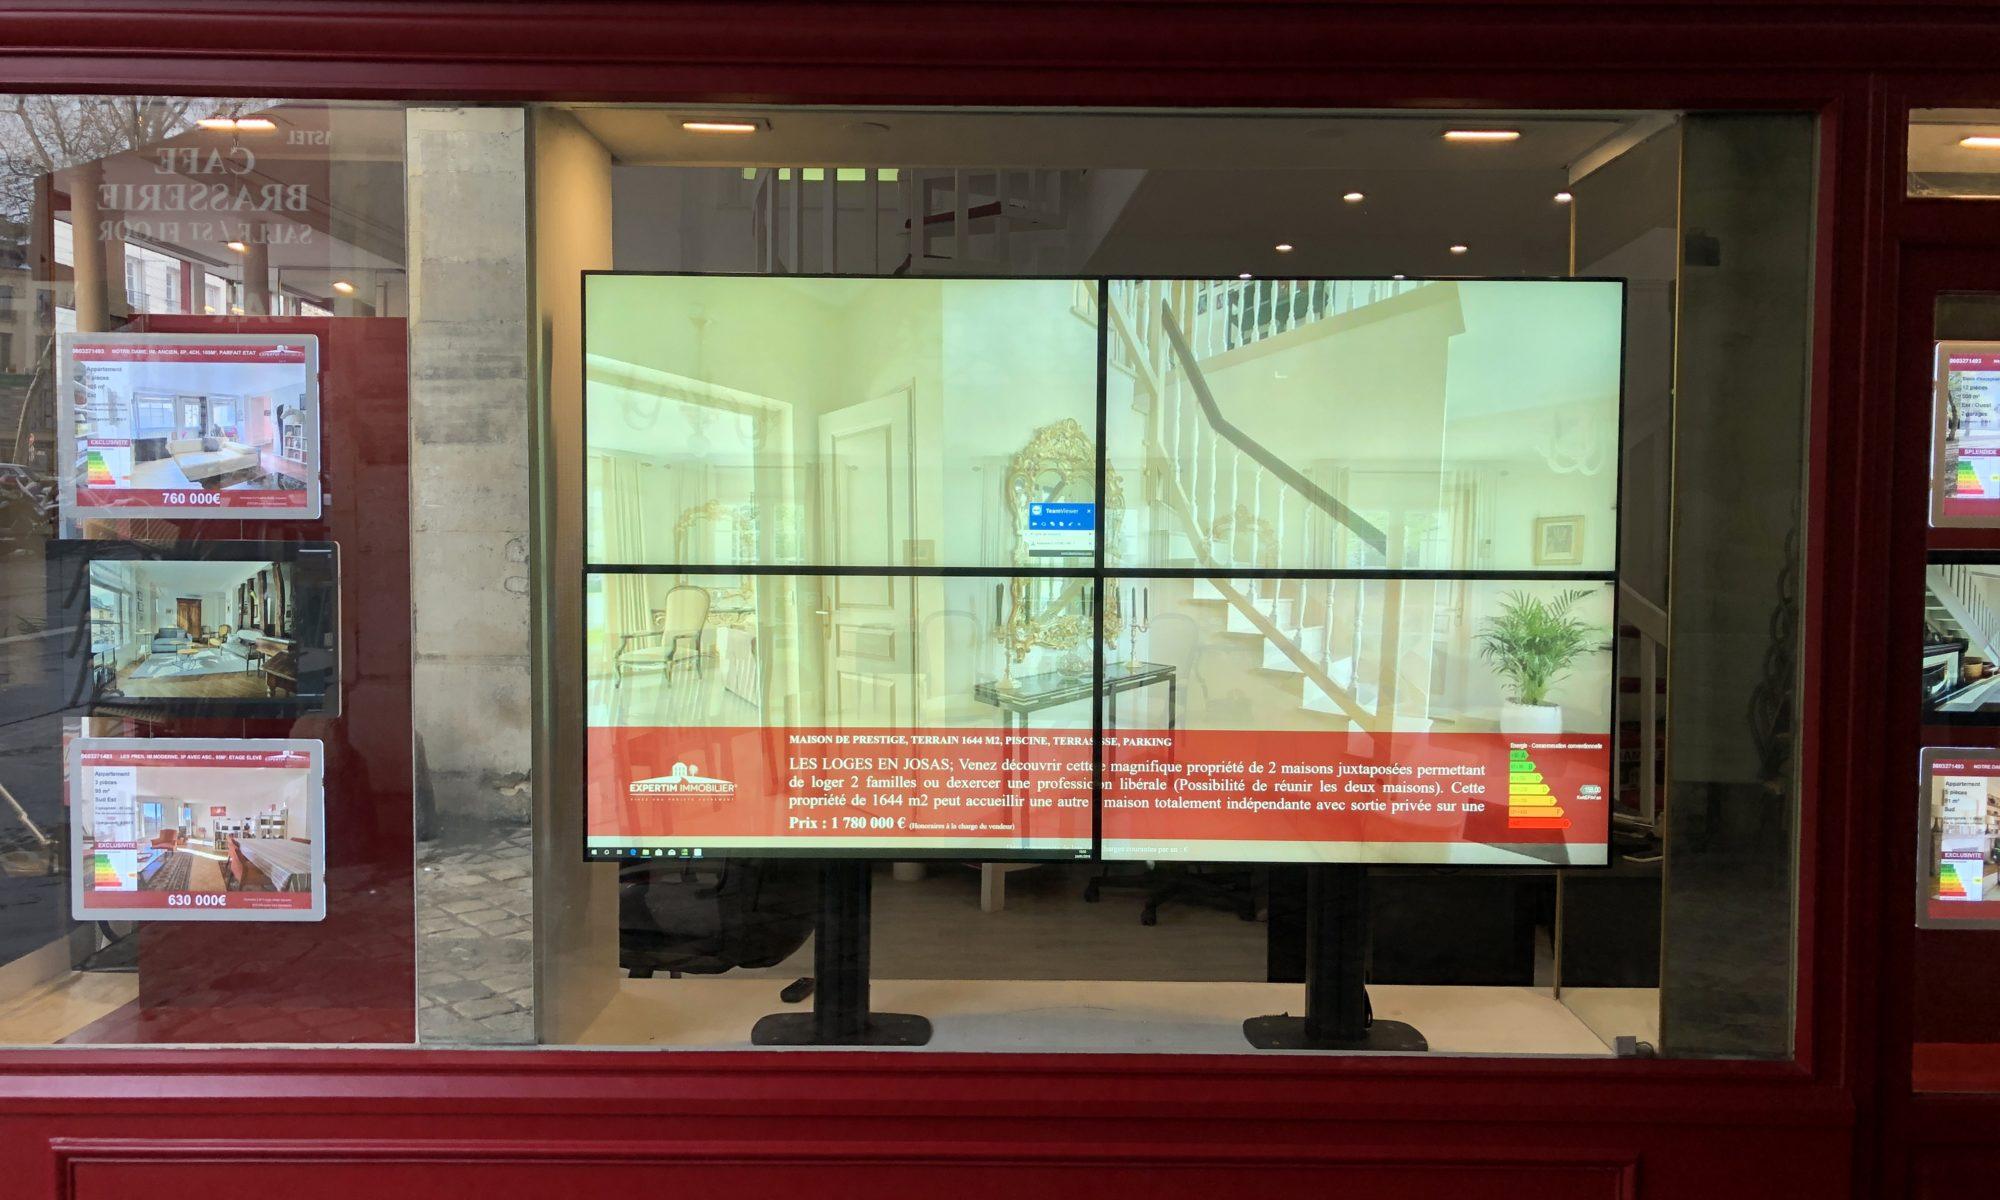 Digital signage installations